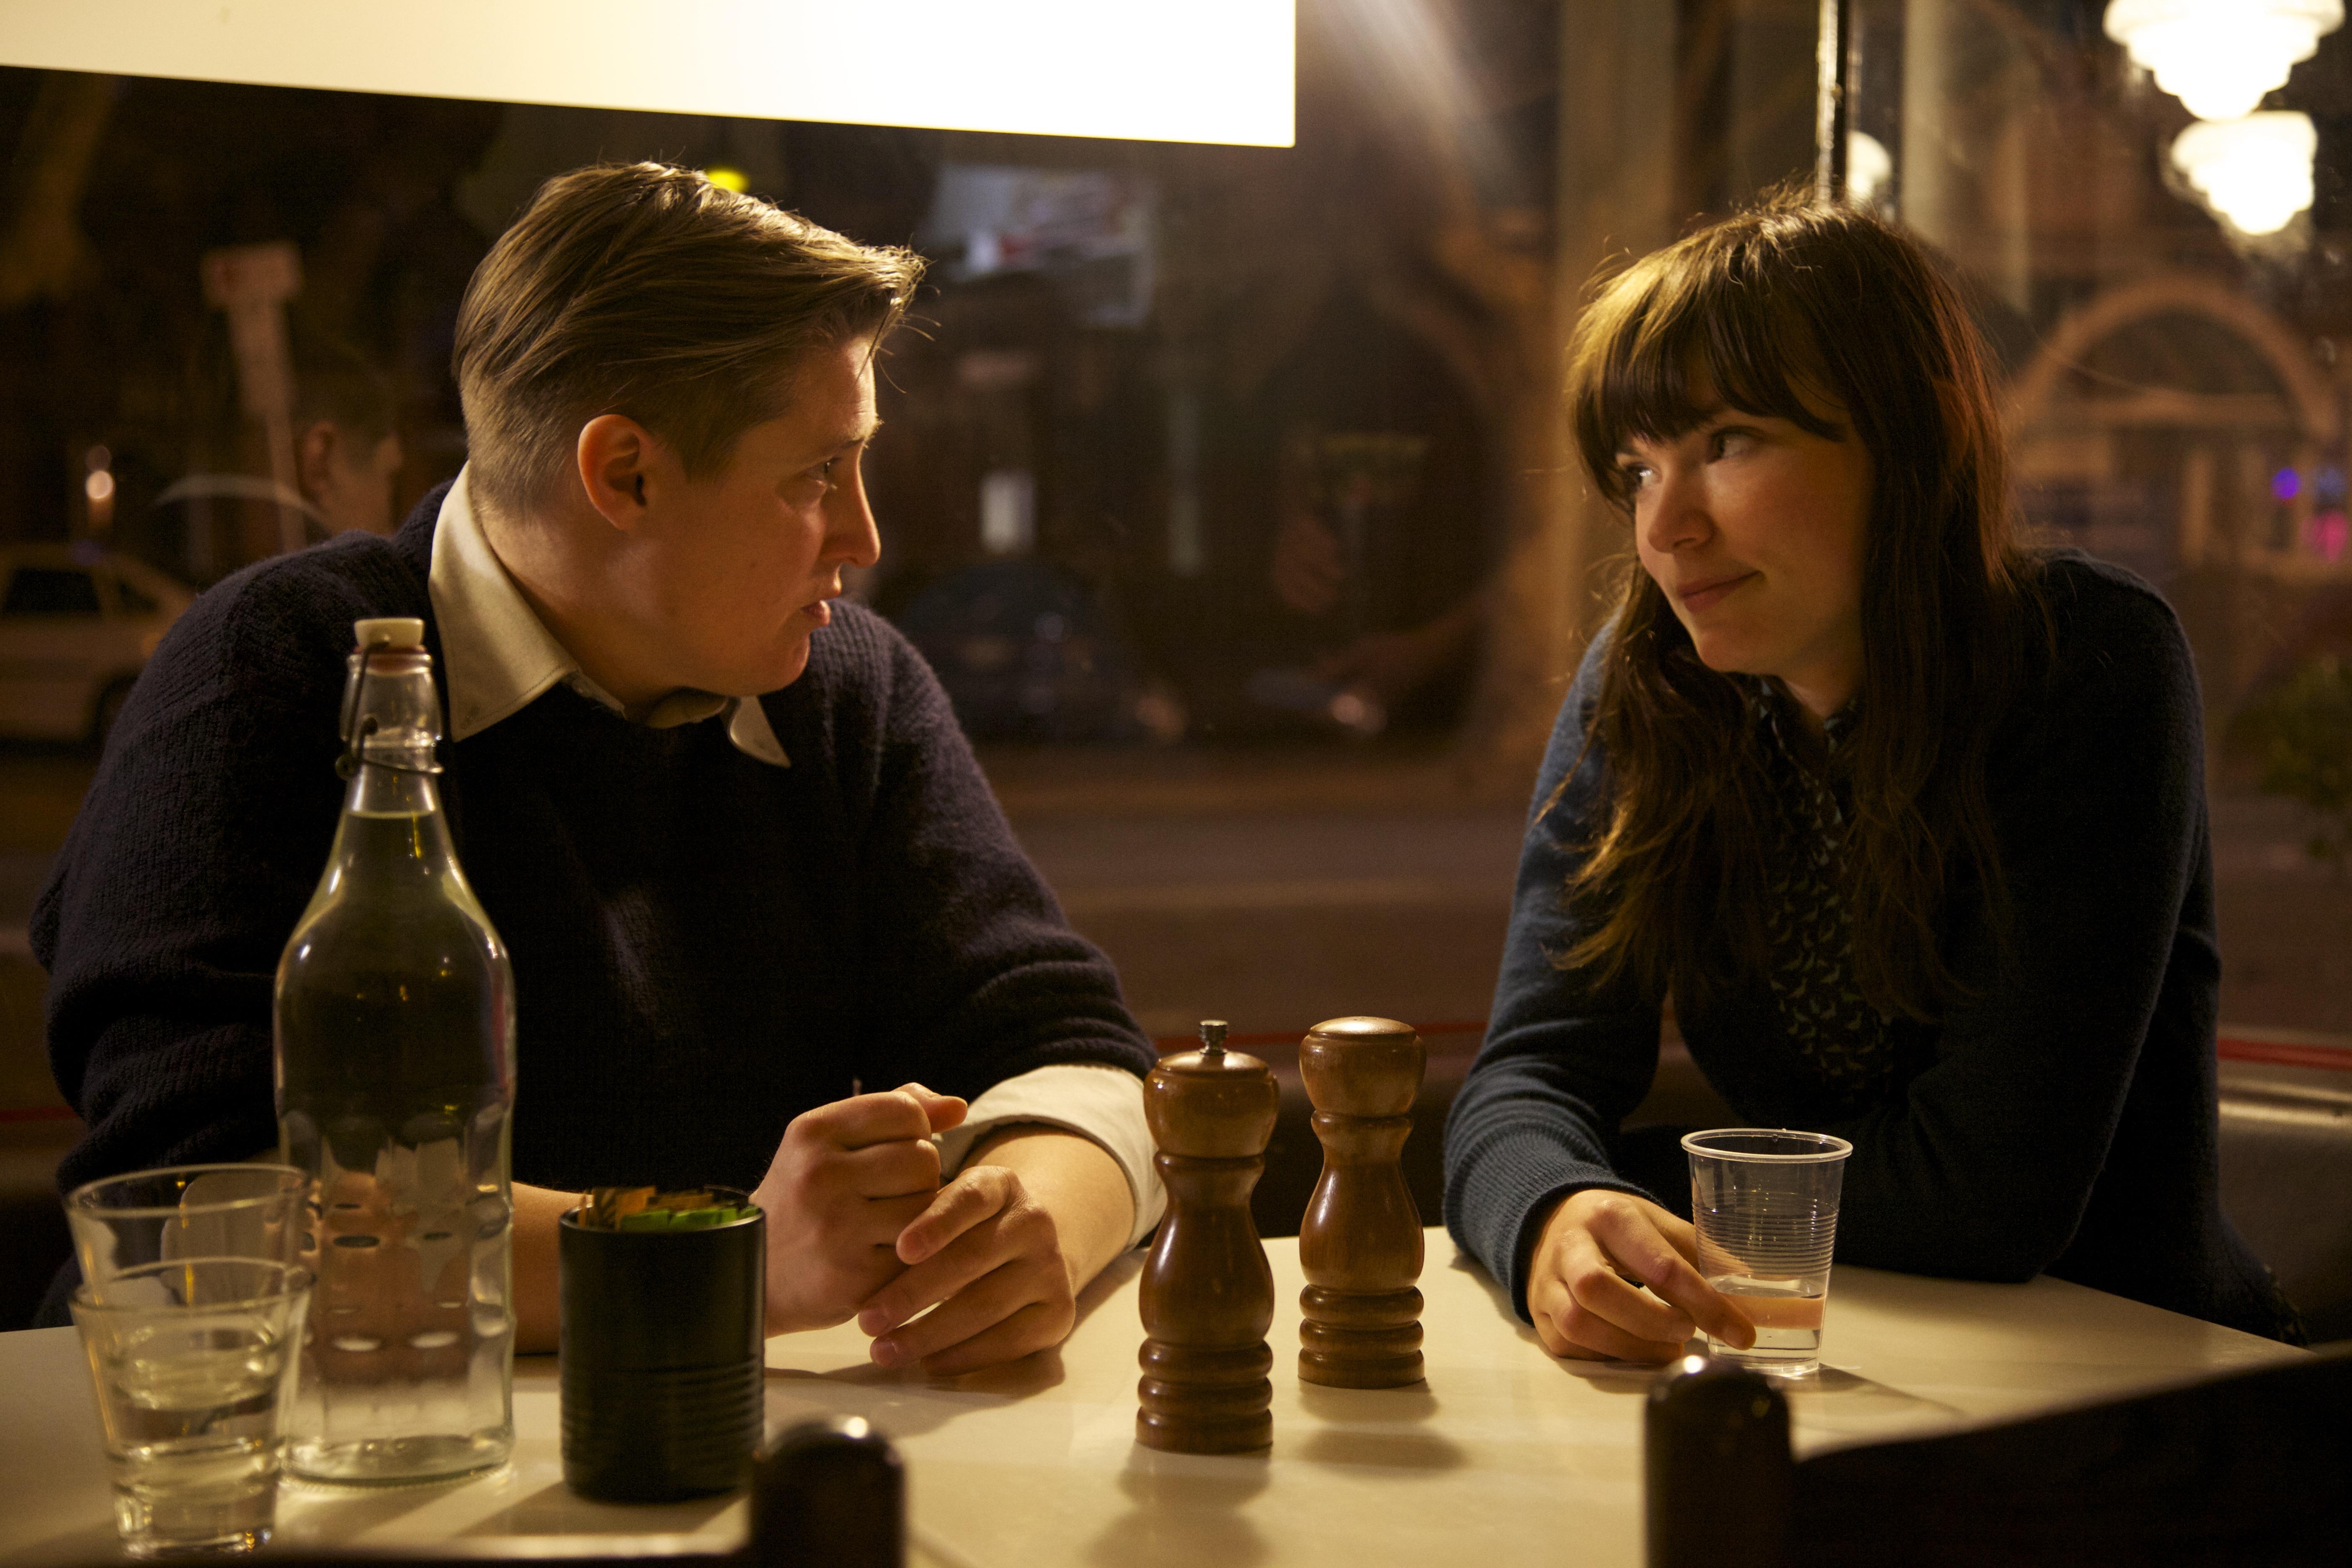 Del Herbert-Jane as James and Tilda Cobham-Hervey as Billie in 52 Tuesdays